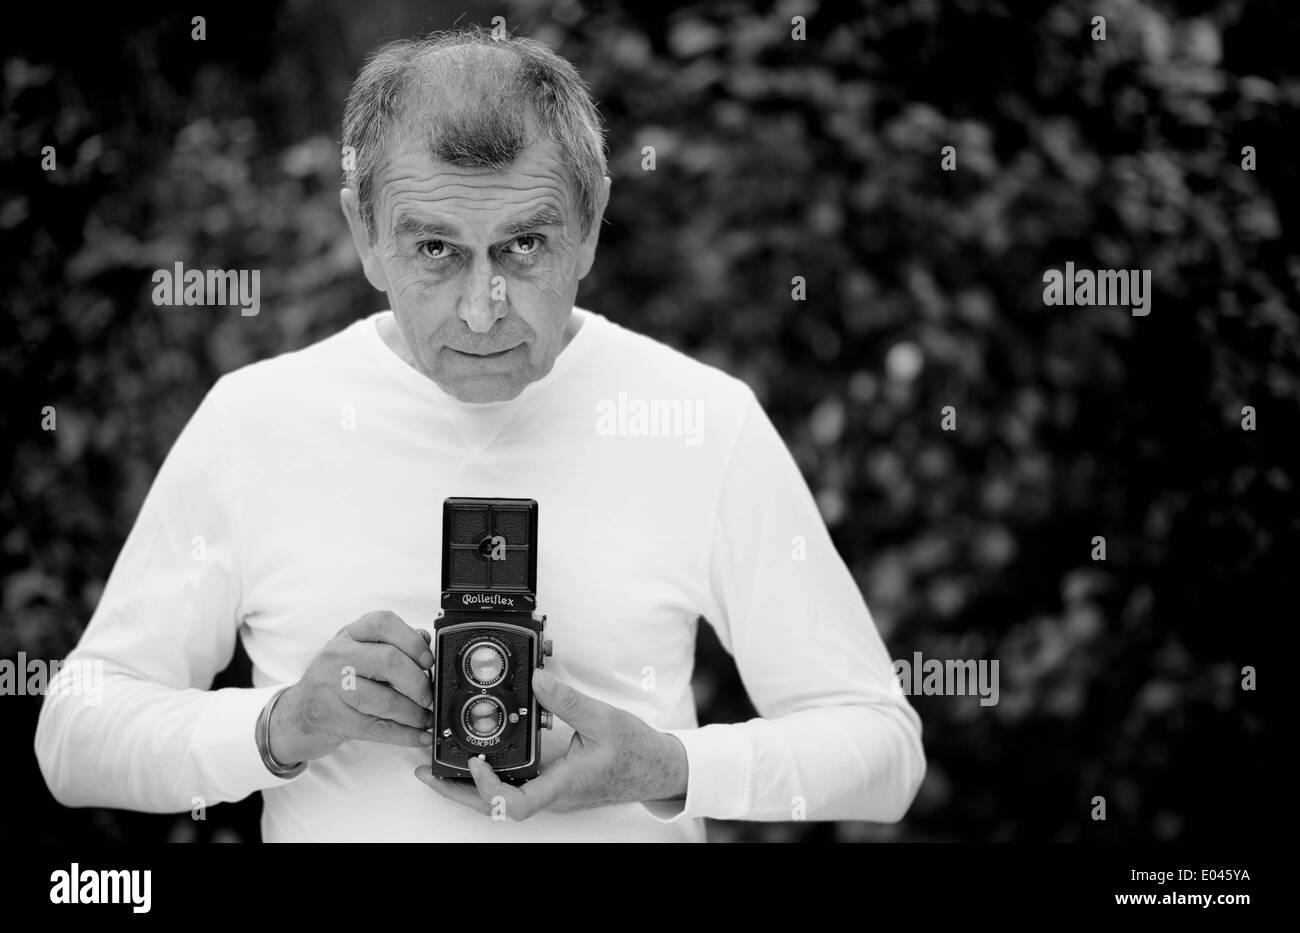 Senior man photographer with Rolleiflex twin lens reflex film camera - Stock Image